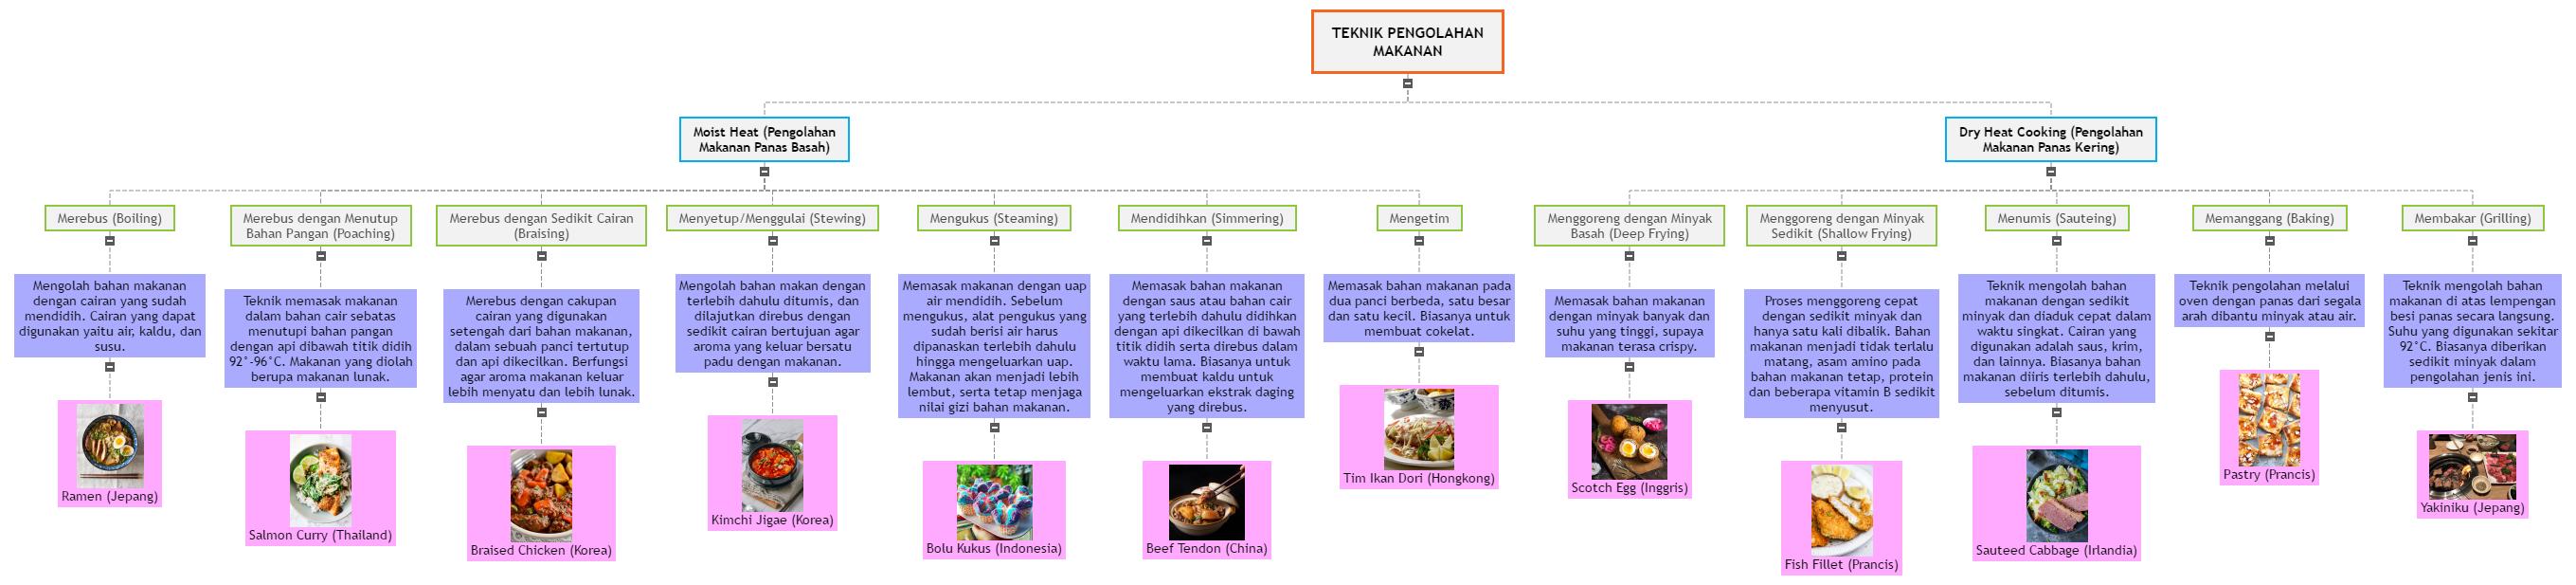 TEKNIK PENGOLAHAN MAKANAN Mind Map